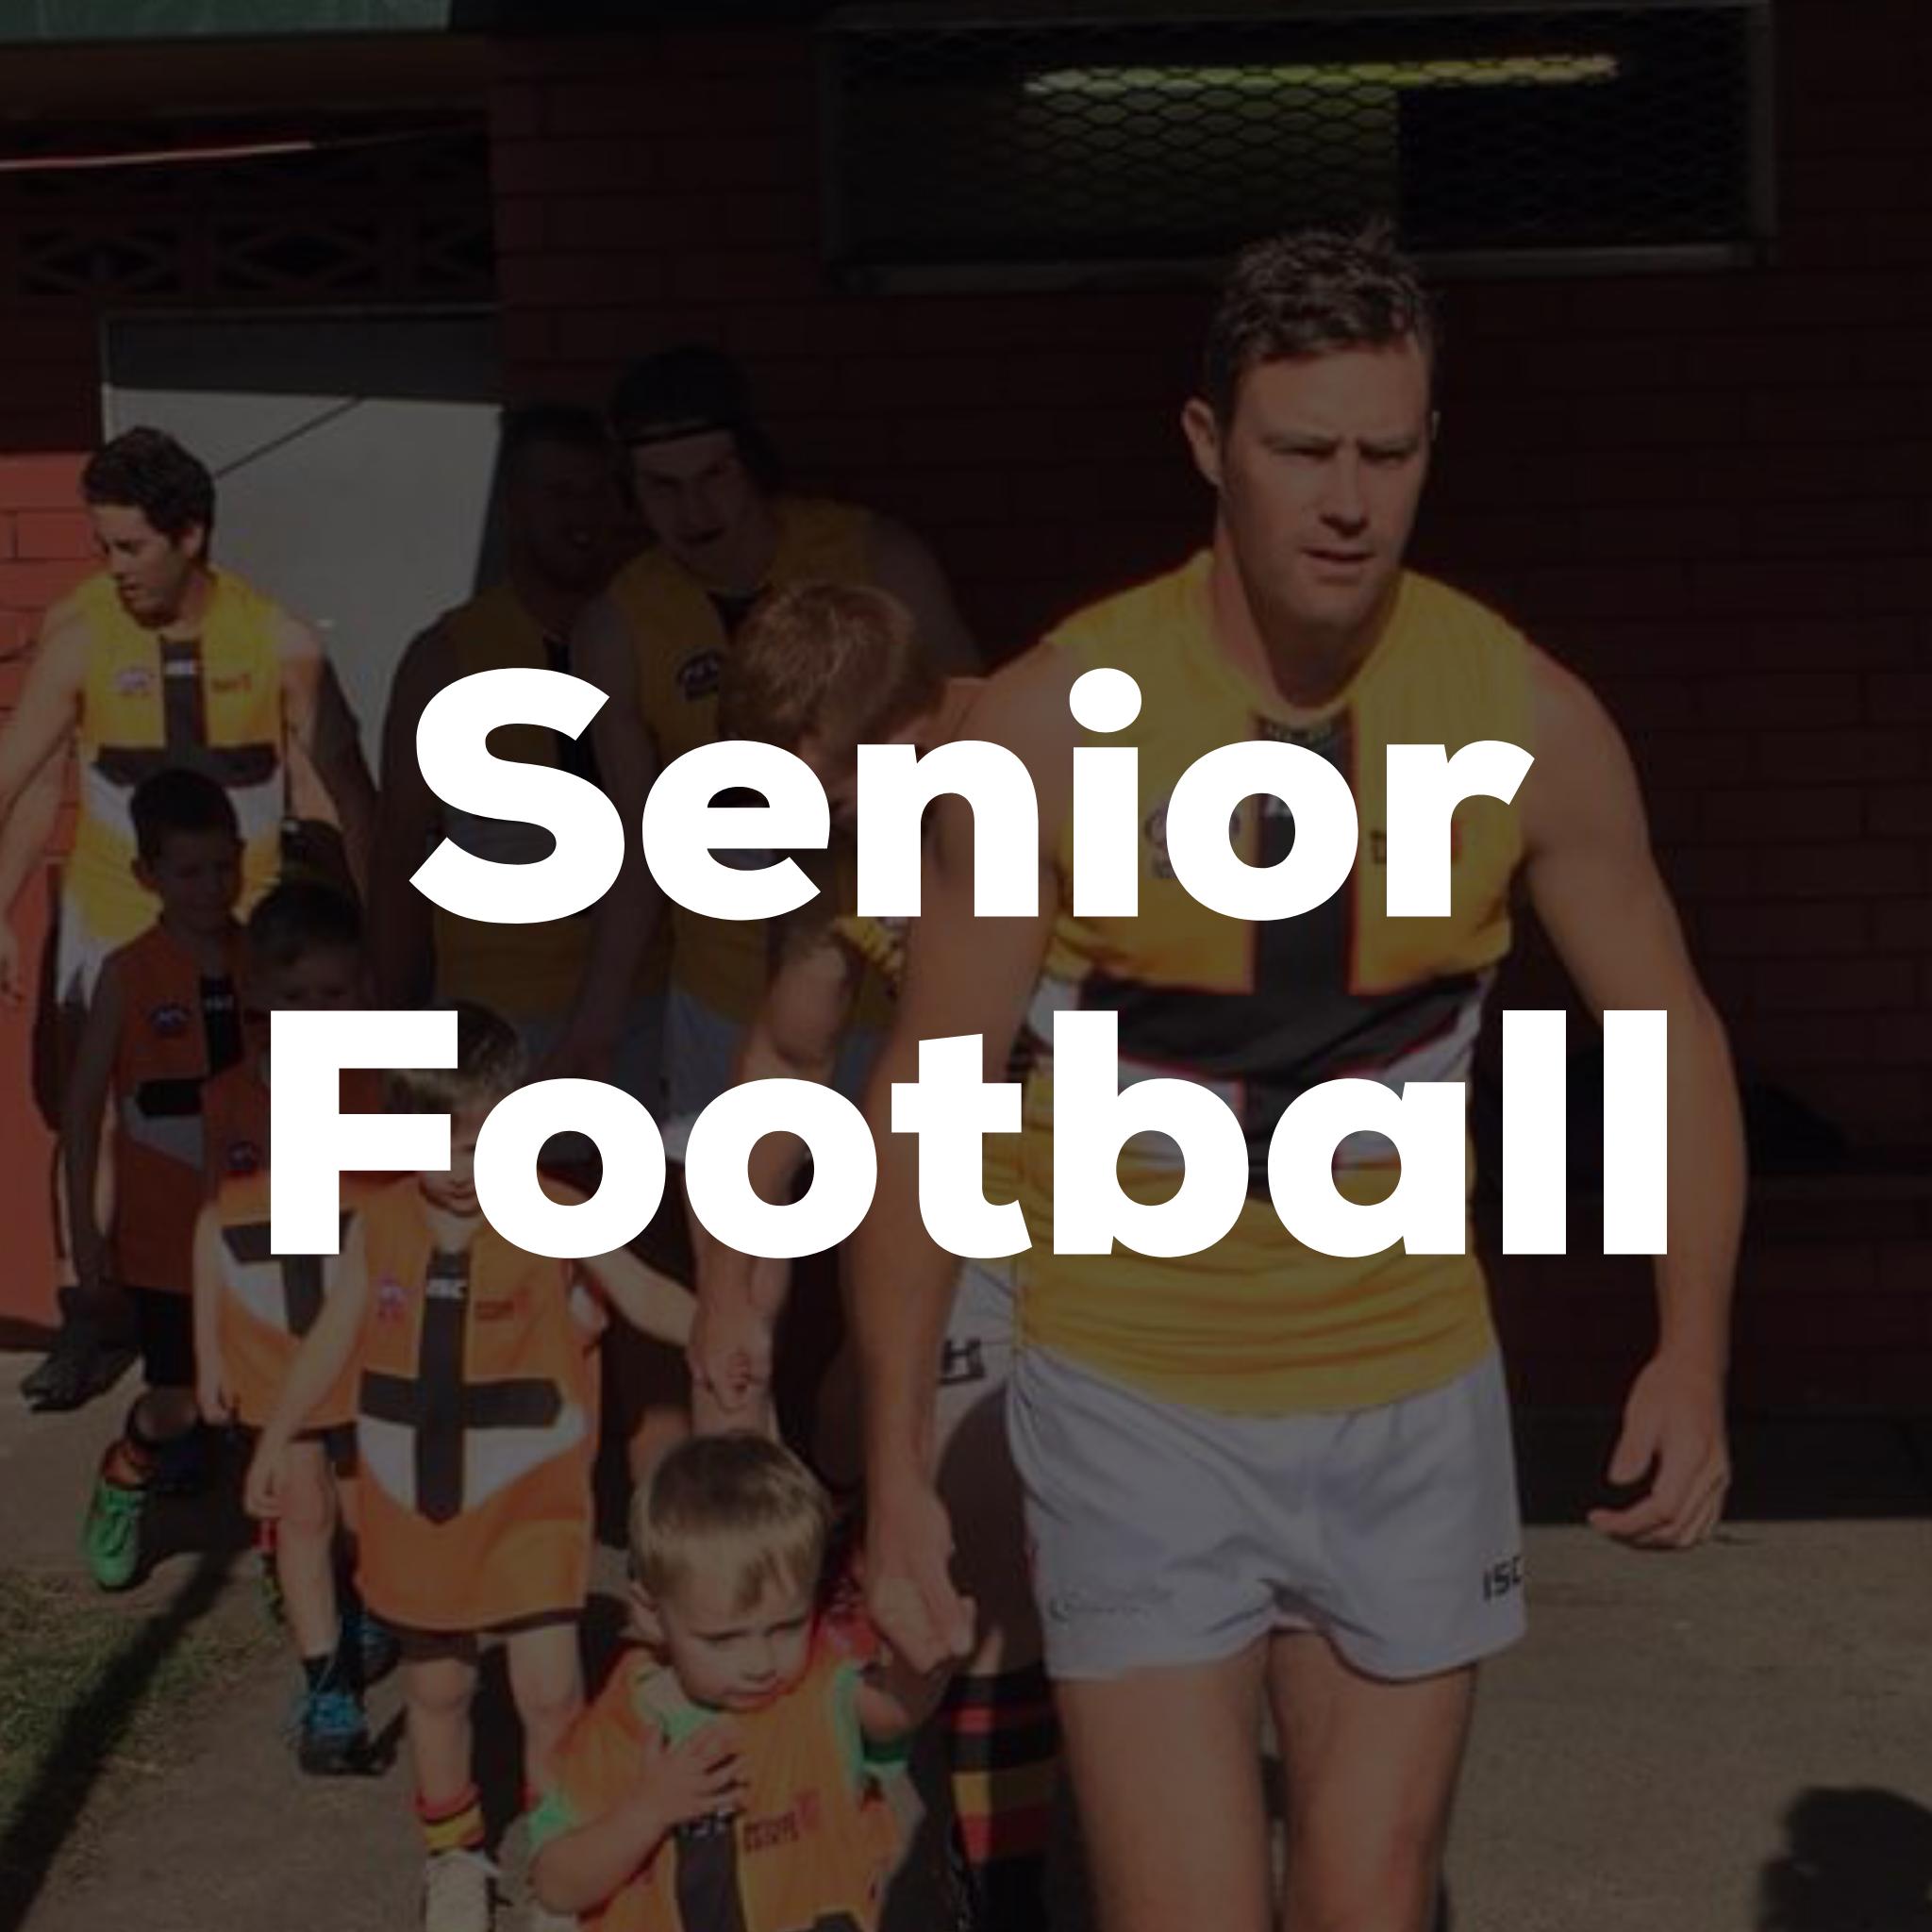 seniorfootballbutton